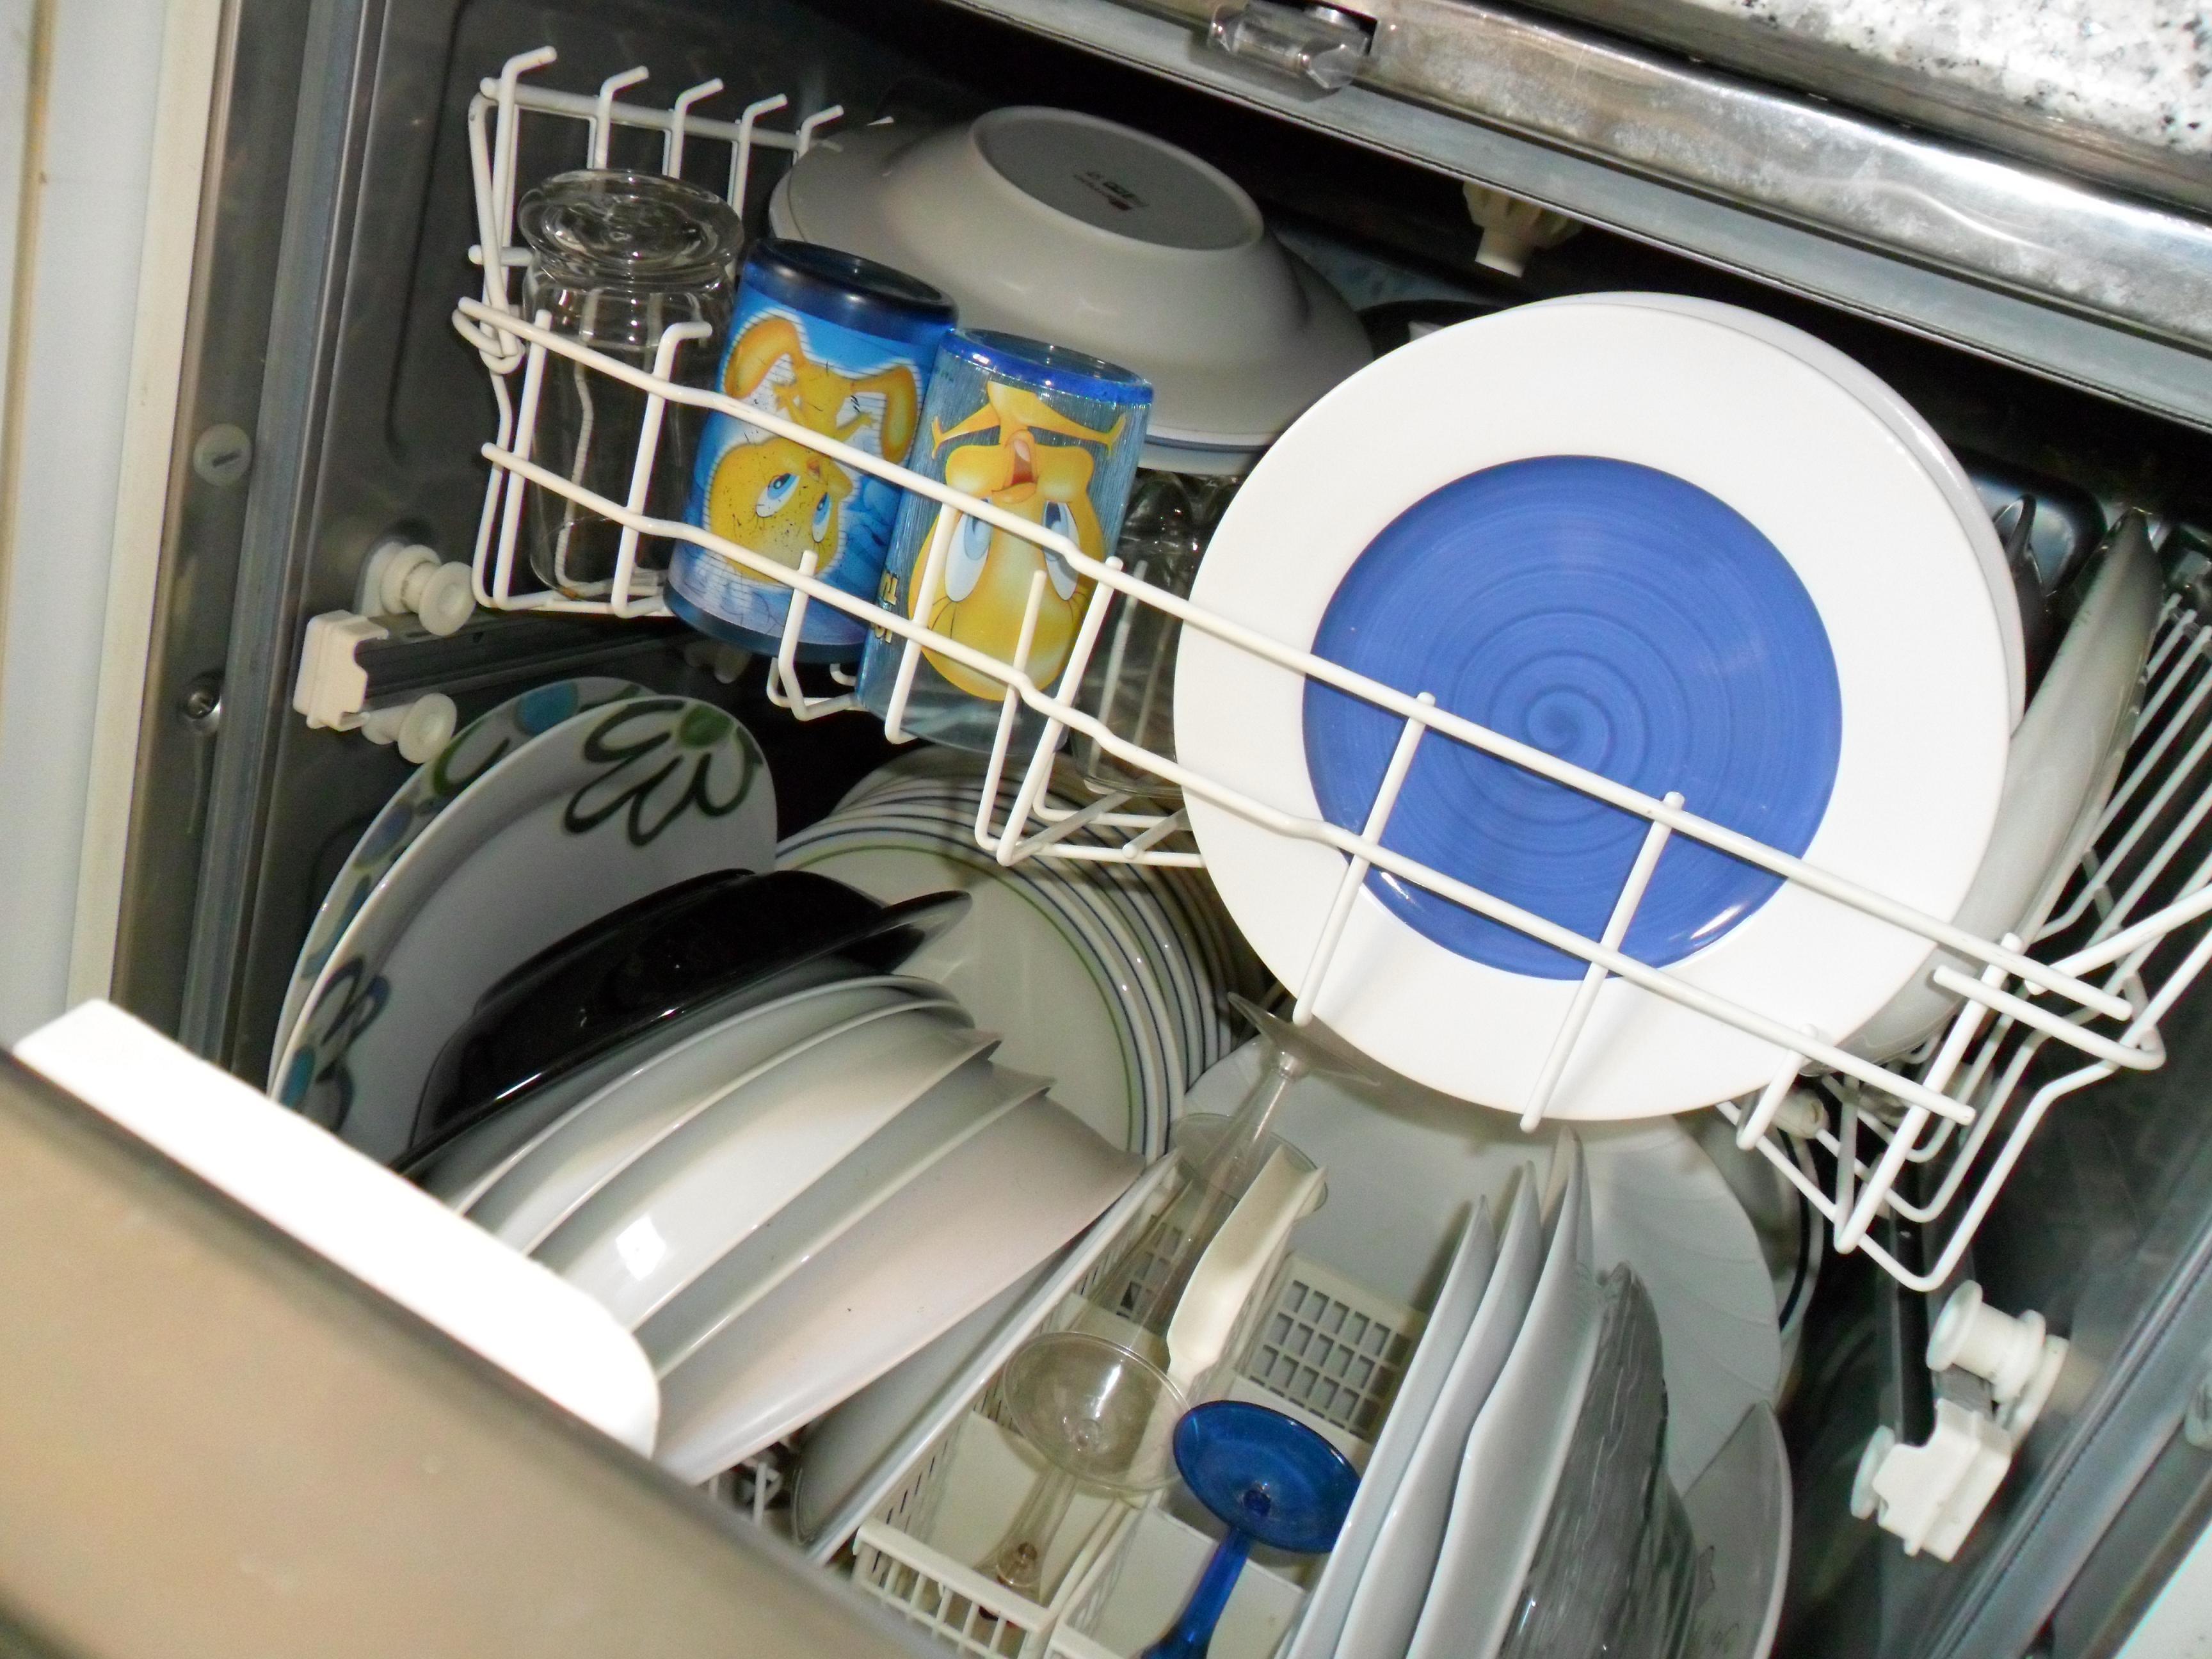 Cosa uso per la lavastoviglie vegan ricette vegane